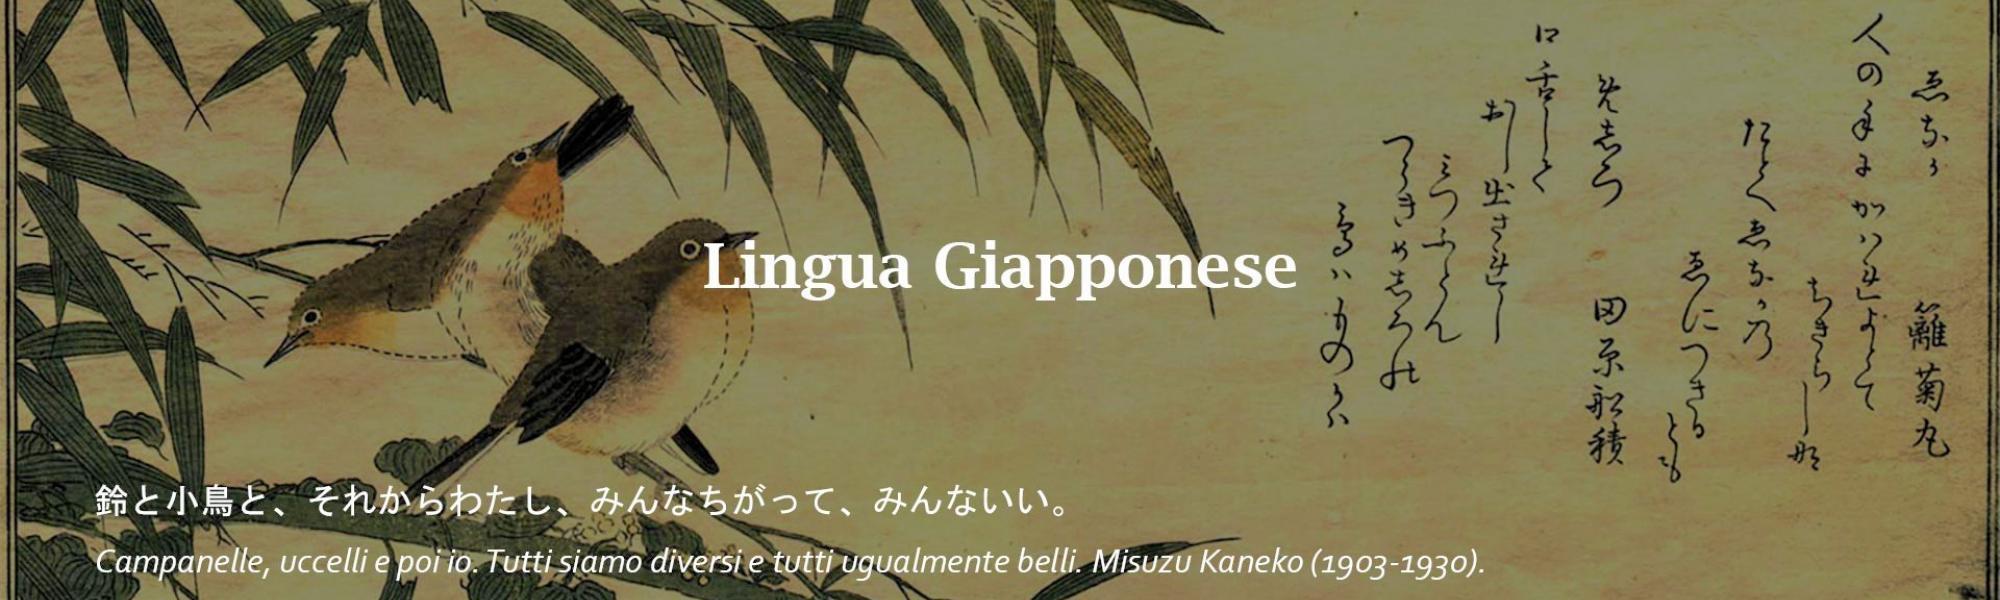 Lingua giapponese Alif (da www.alif.it)